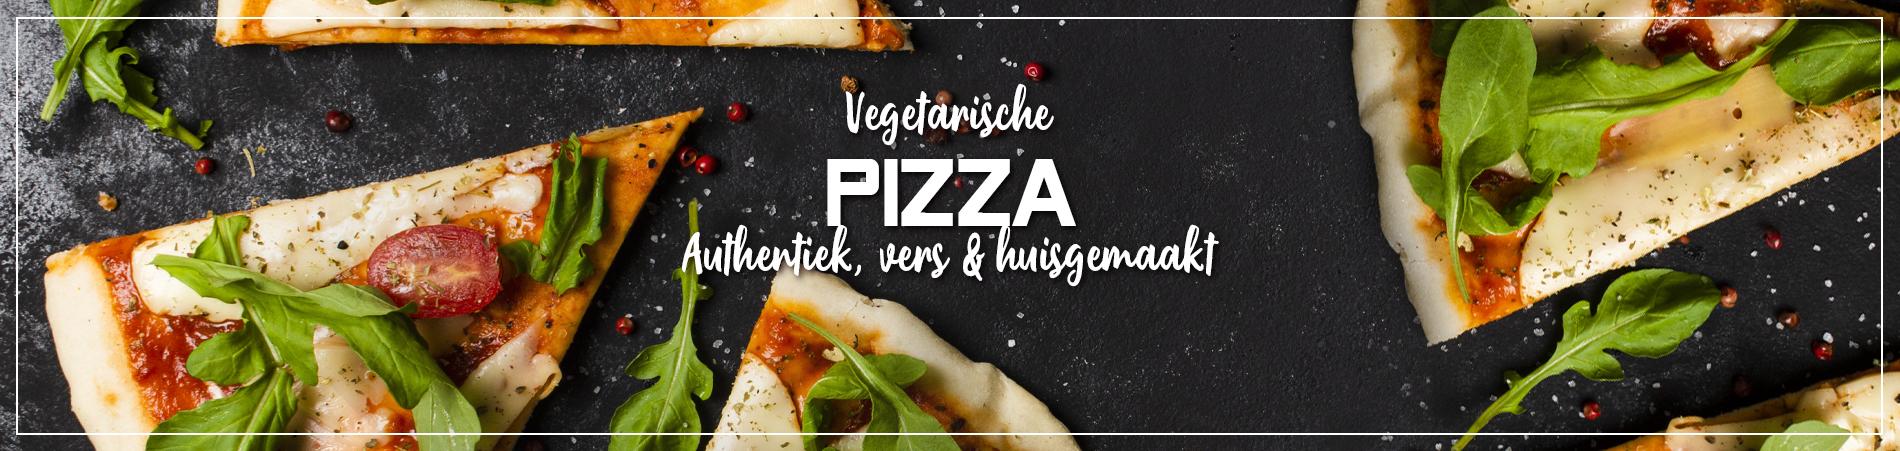 Verse Pizza vegetarisch